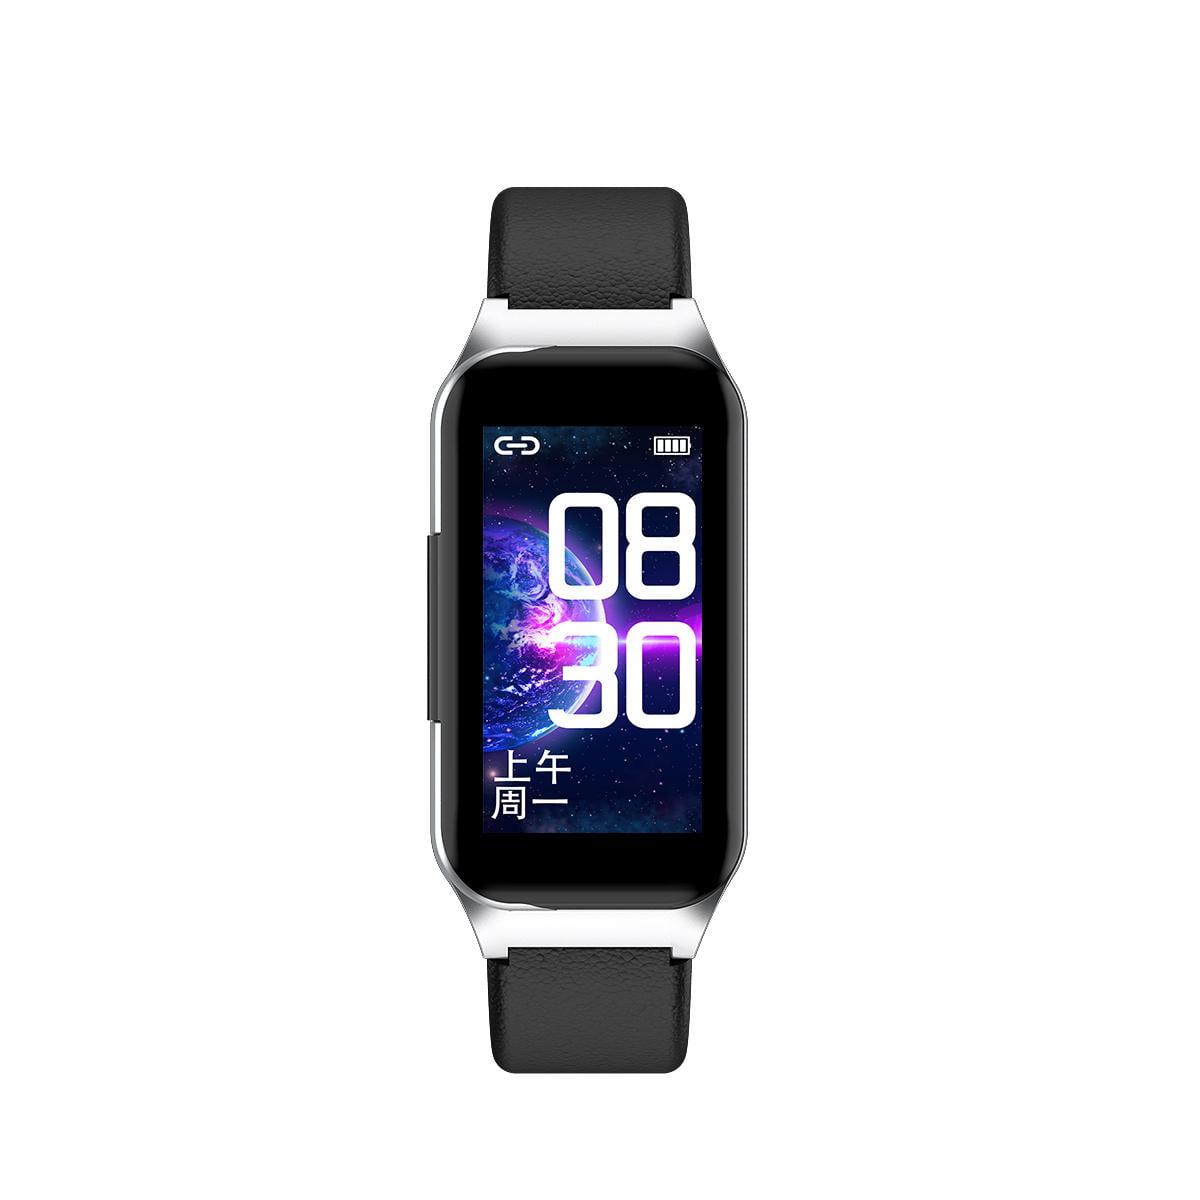 Bakeey smartwatch L818 bt5.0 intelligent noise reduction wireless earphone wristband (18)